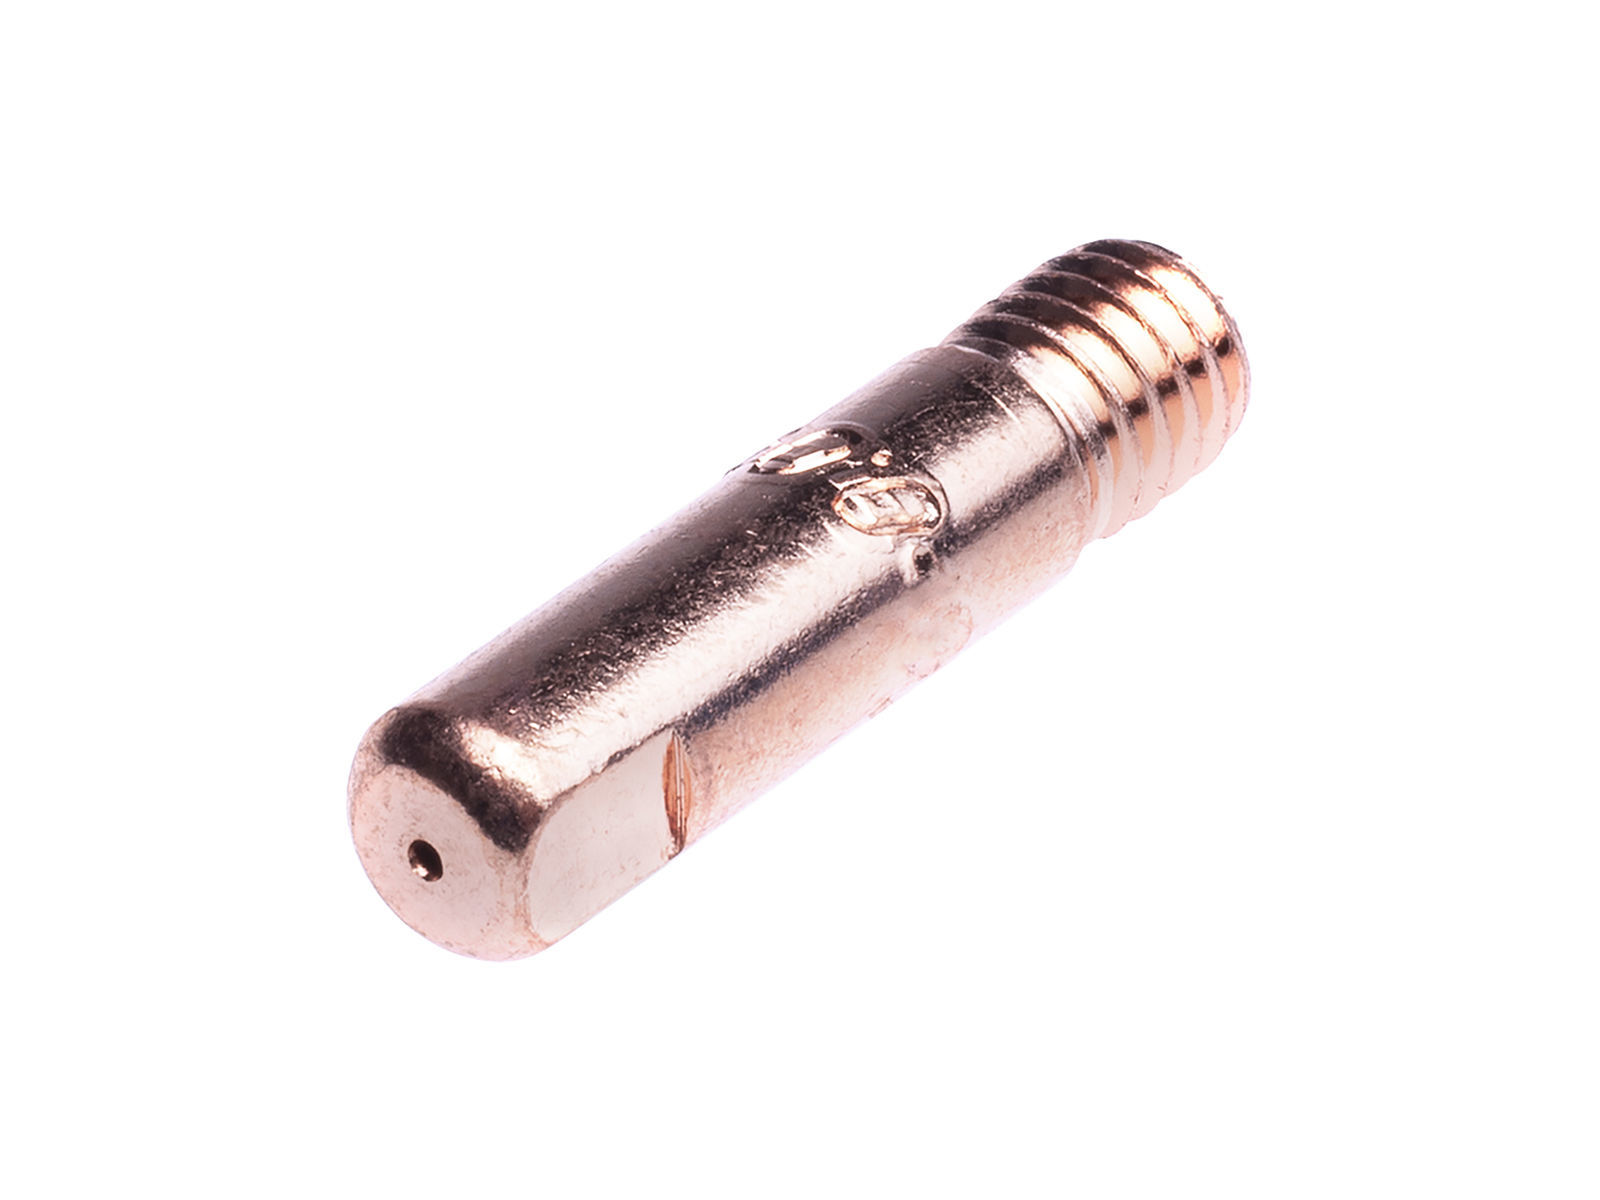 Bilde av Tråddyse stål Ø0,6 mm 5 stk